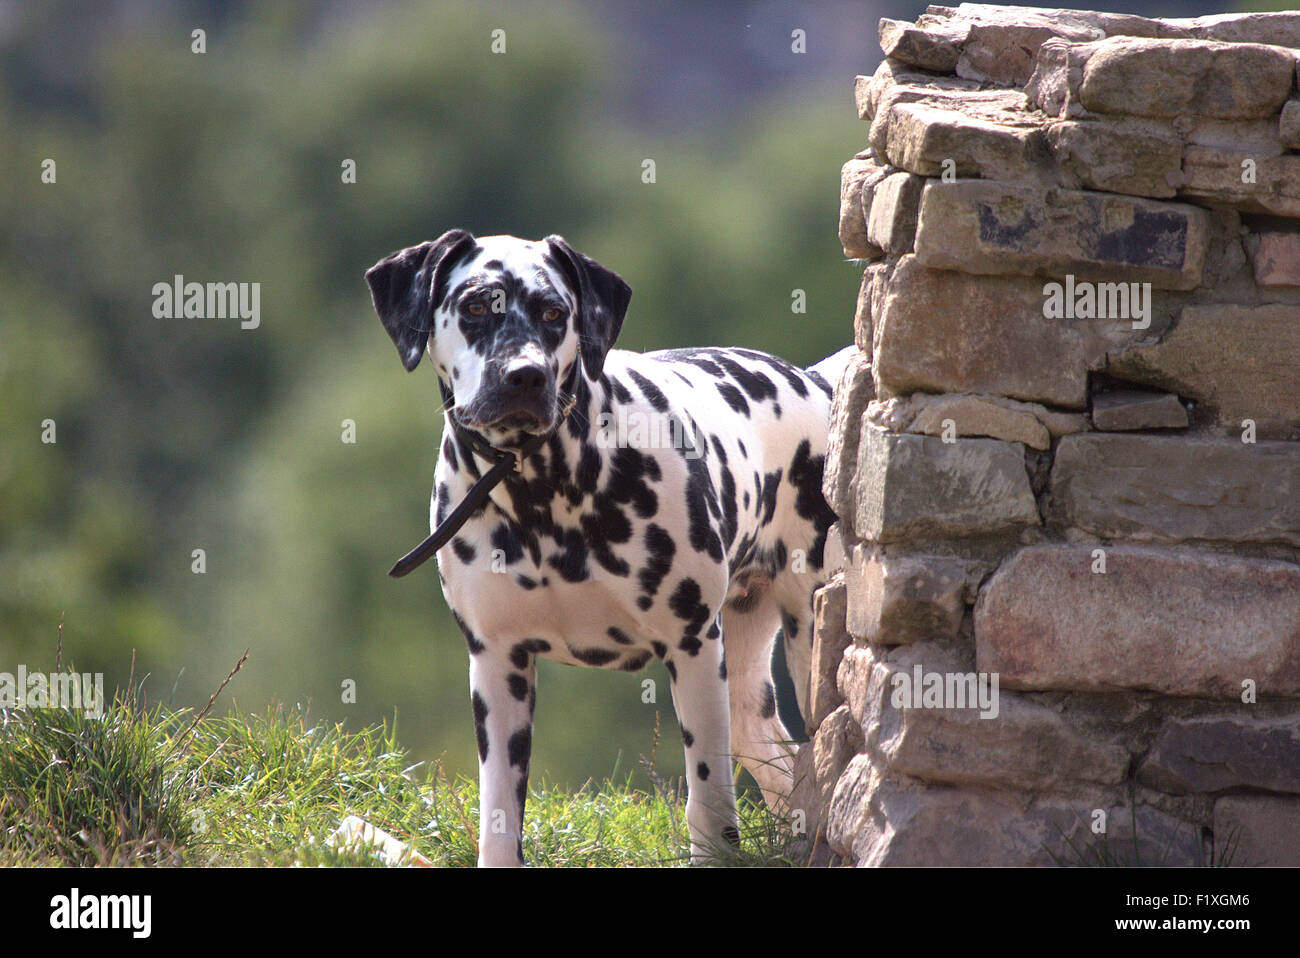 Dalmatian Beacon Country Park Lancashire - Stock Image